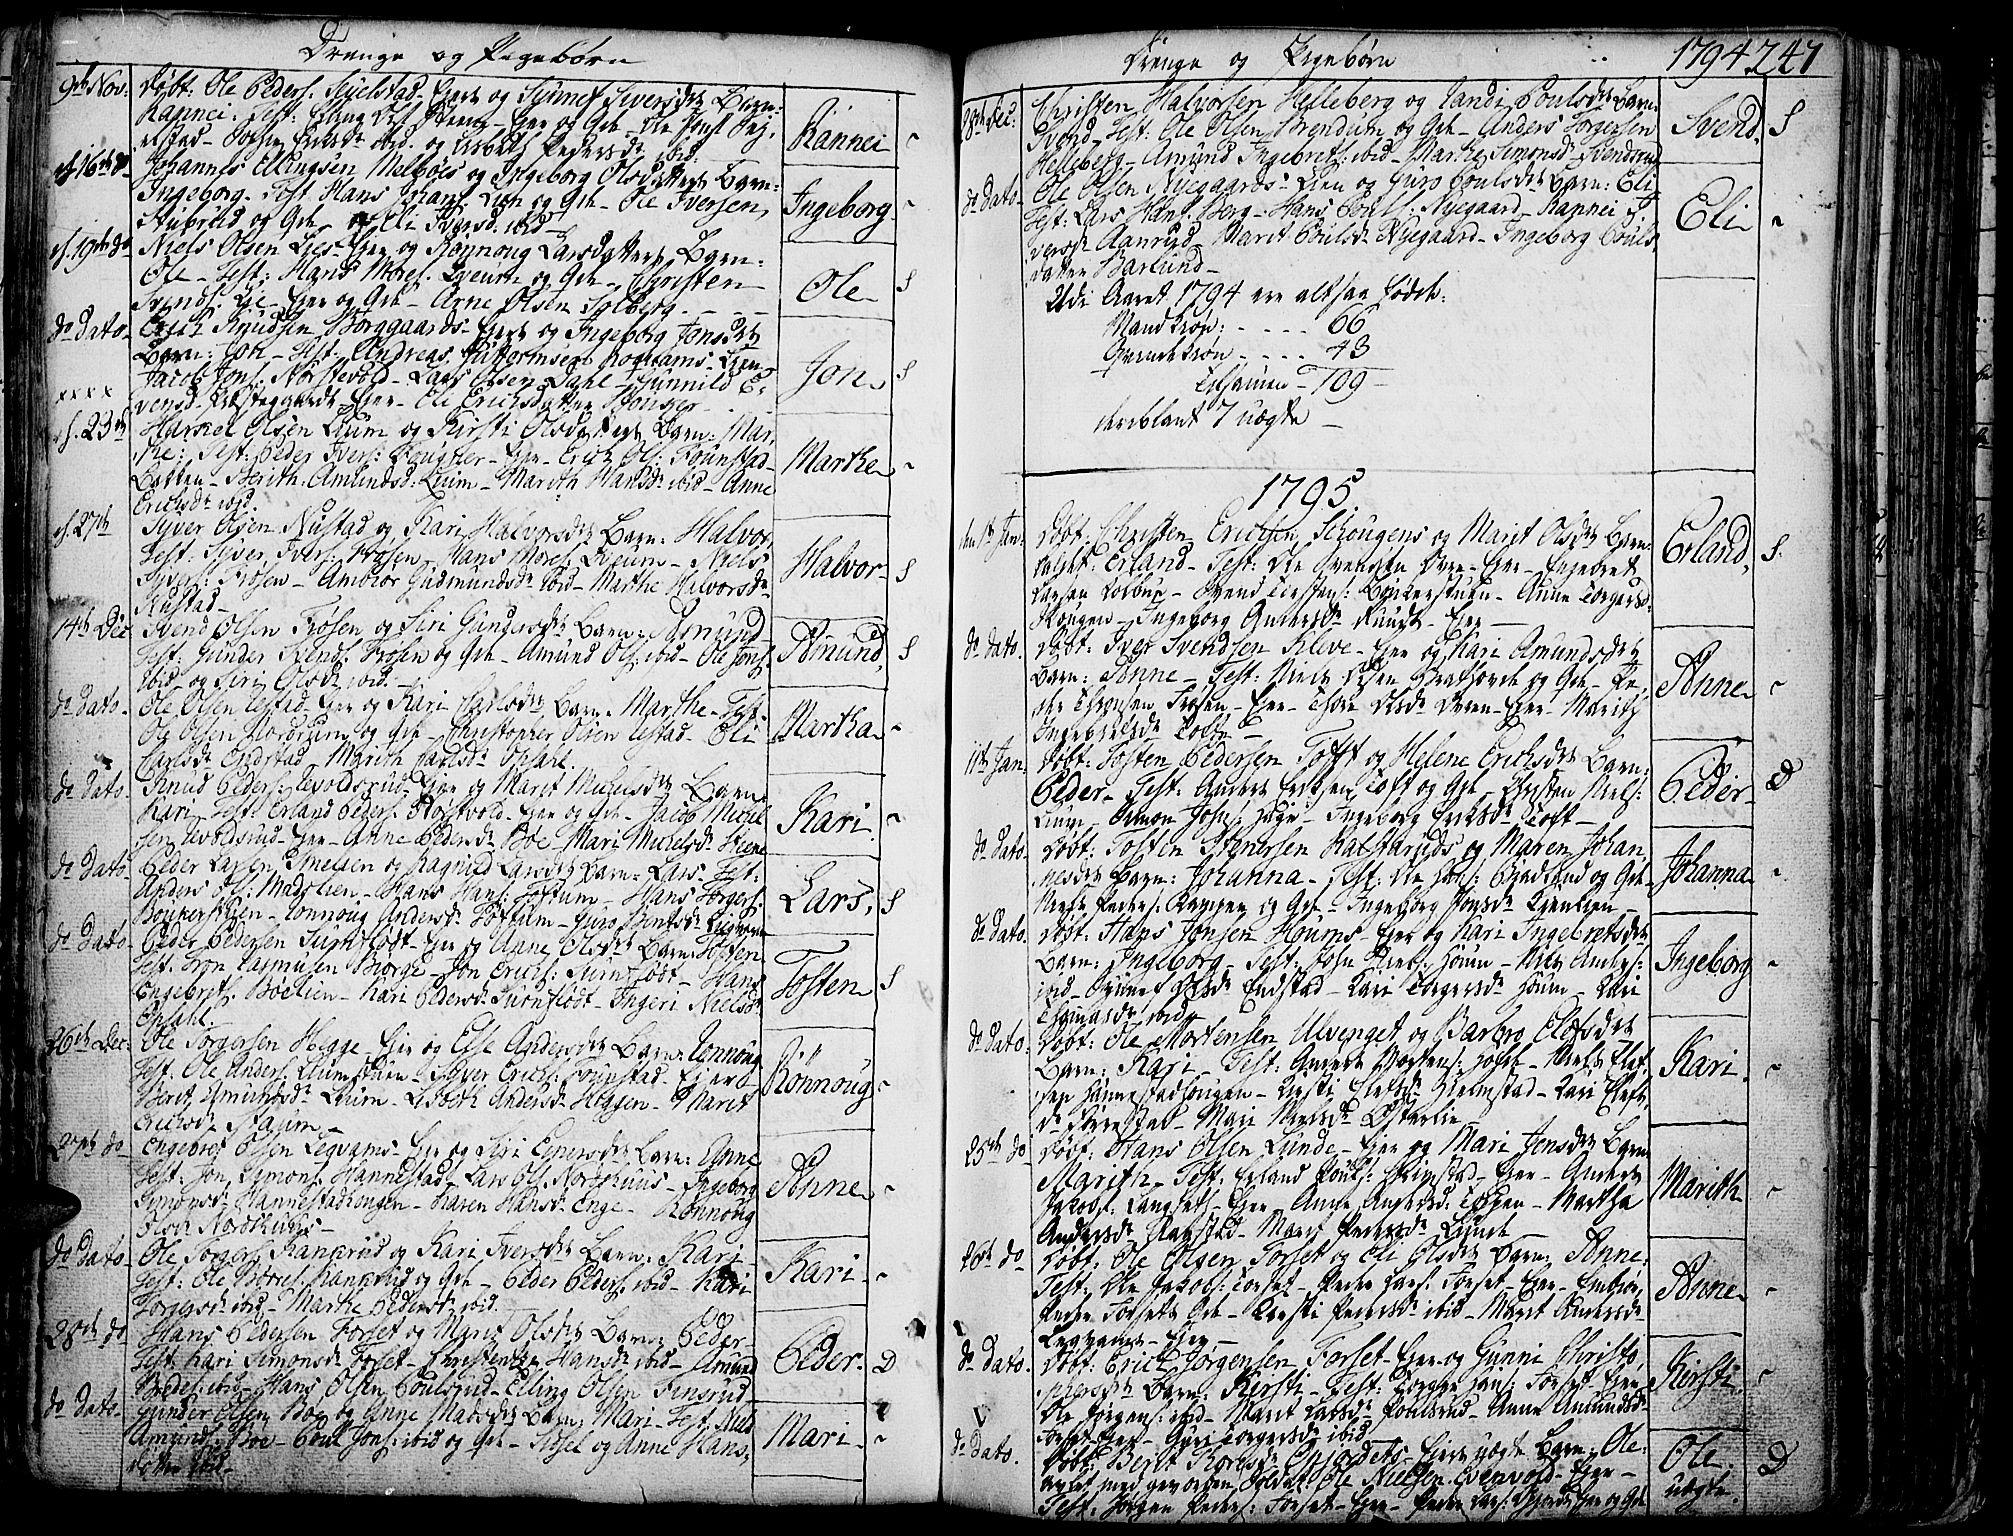 SAH, Gausdal prestekontor, Ministerialbok nr. 3, 1758-1809, s. 247